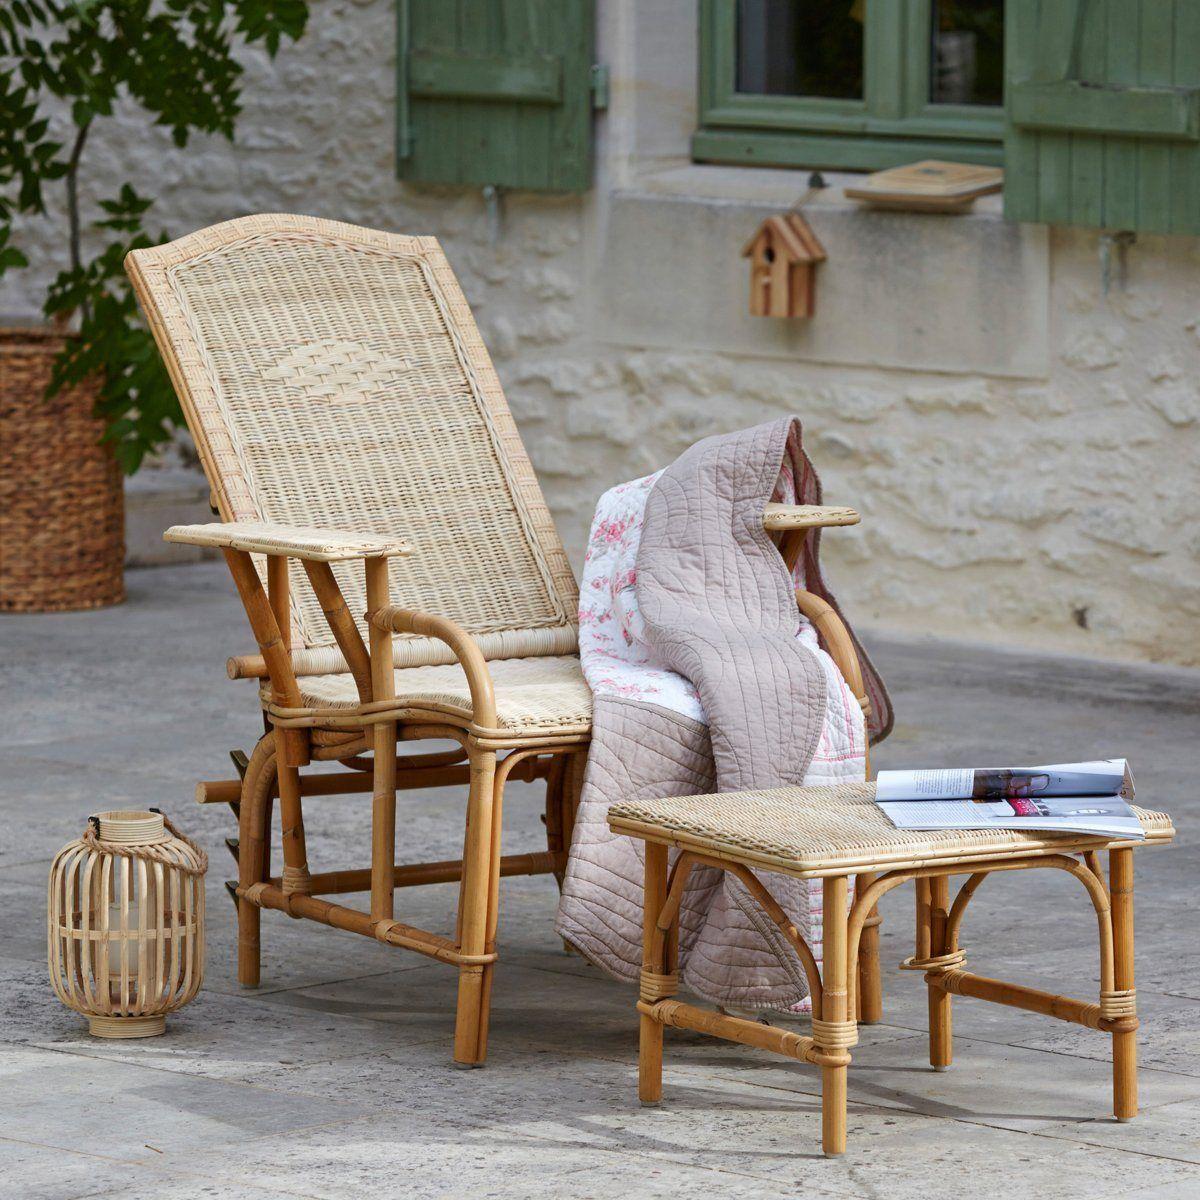 Chaise longue + repose-pieds rotin, KOK,Nantucket | Deco ...